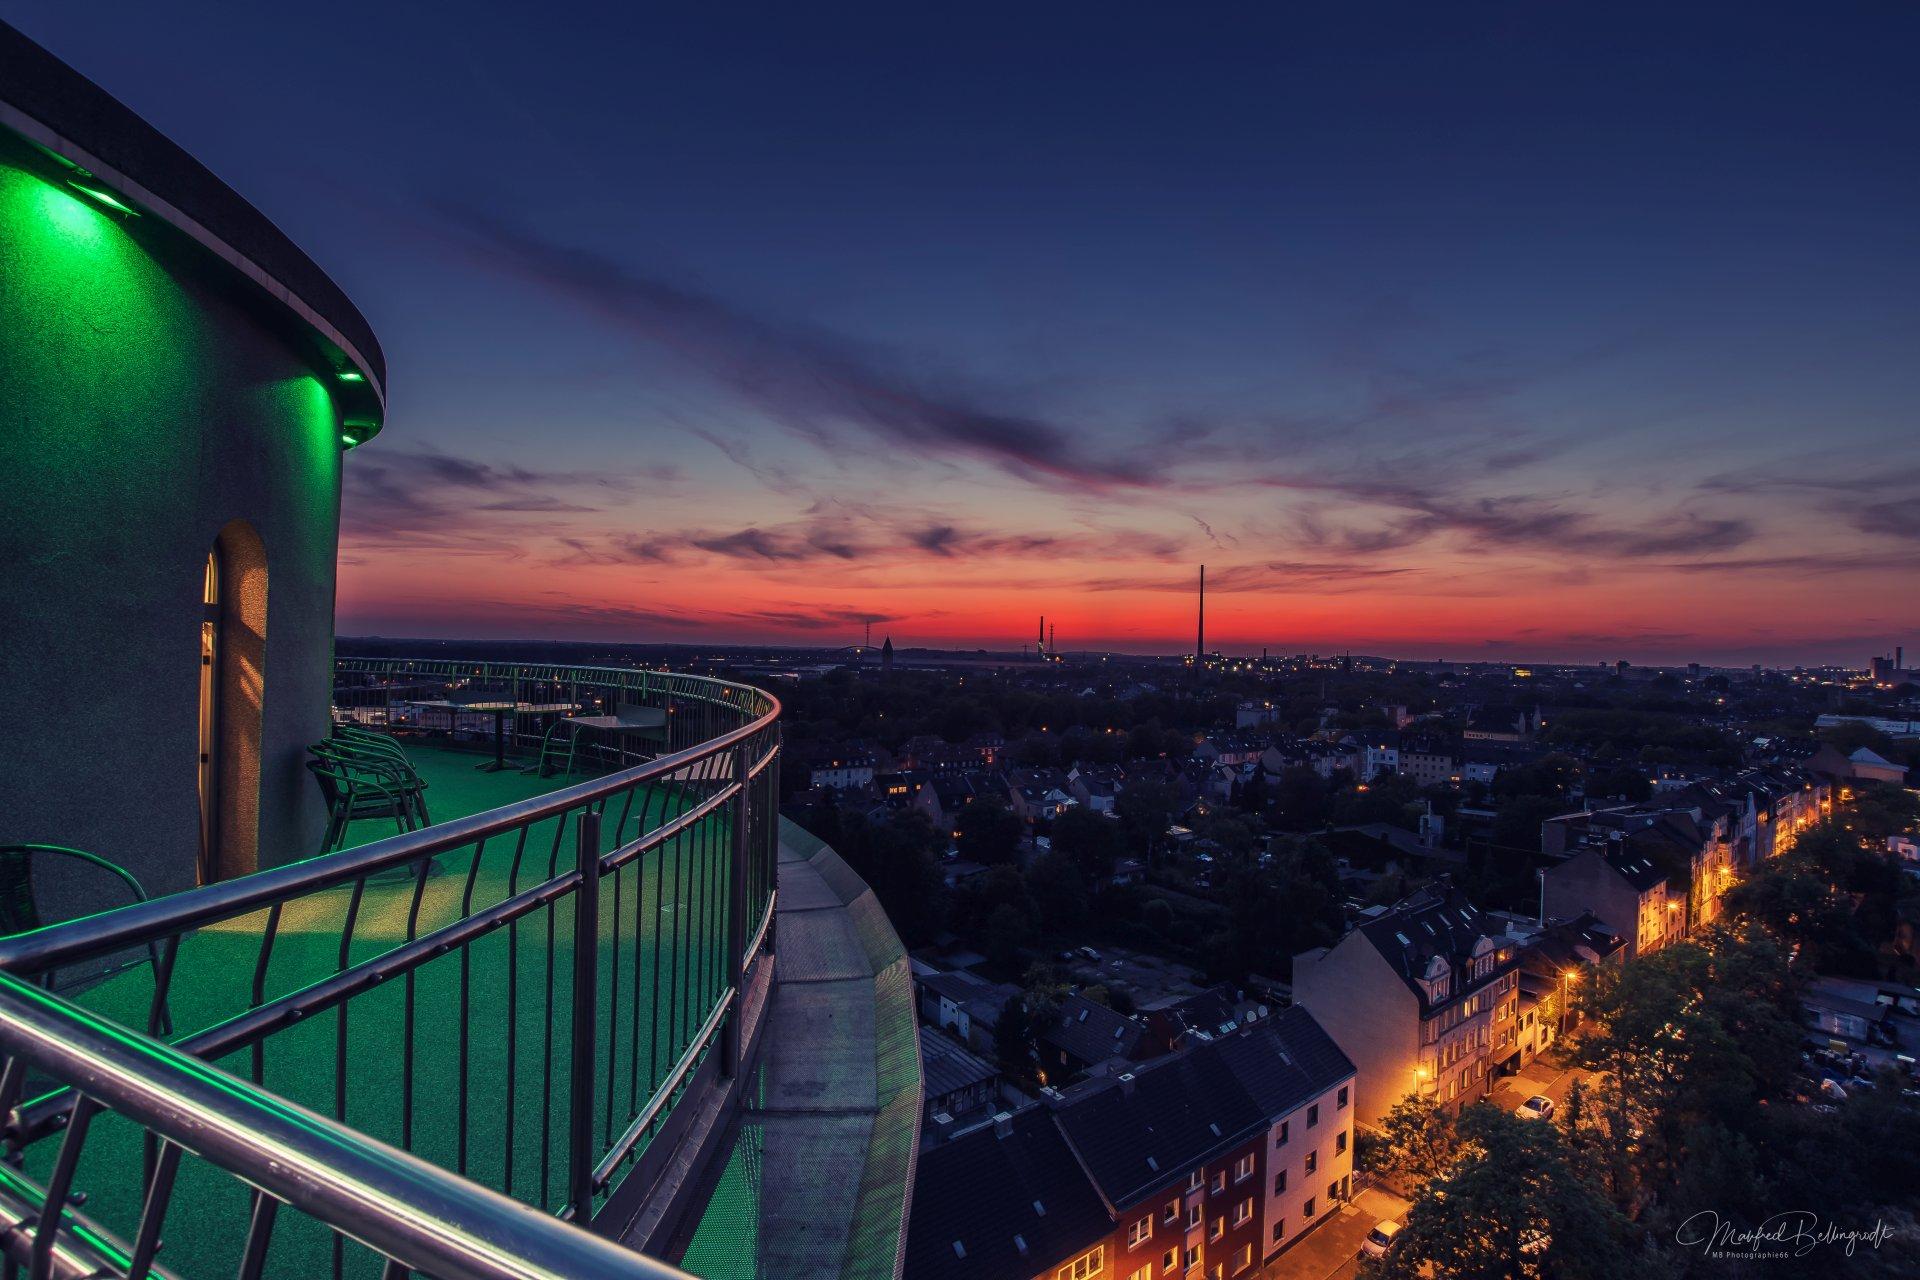 Akkurt Wasserturm Sonnenuntergang